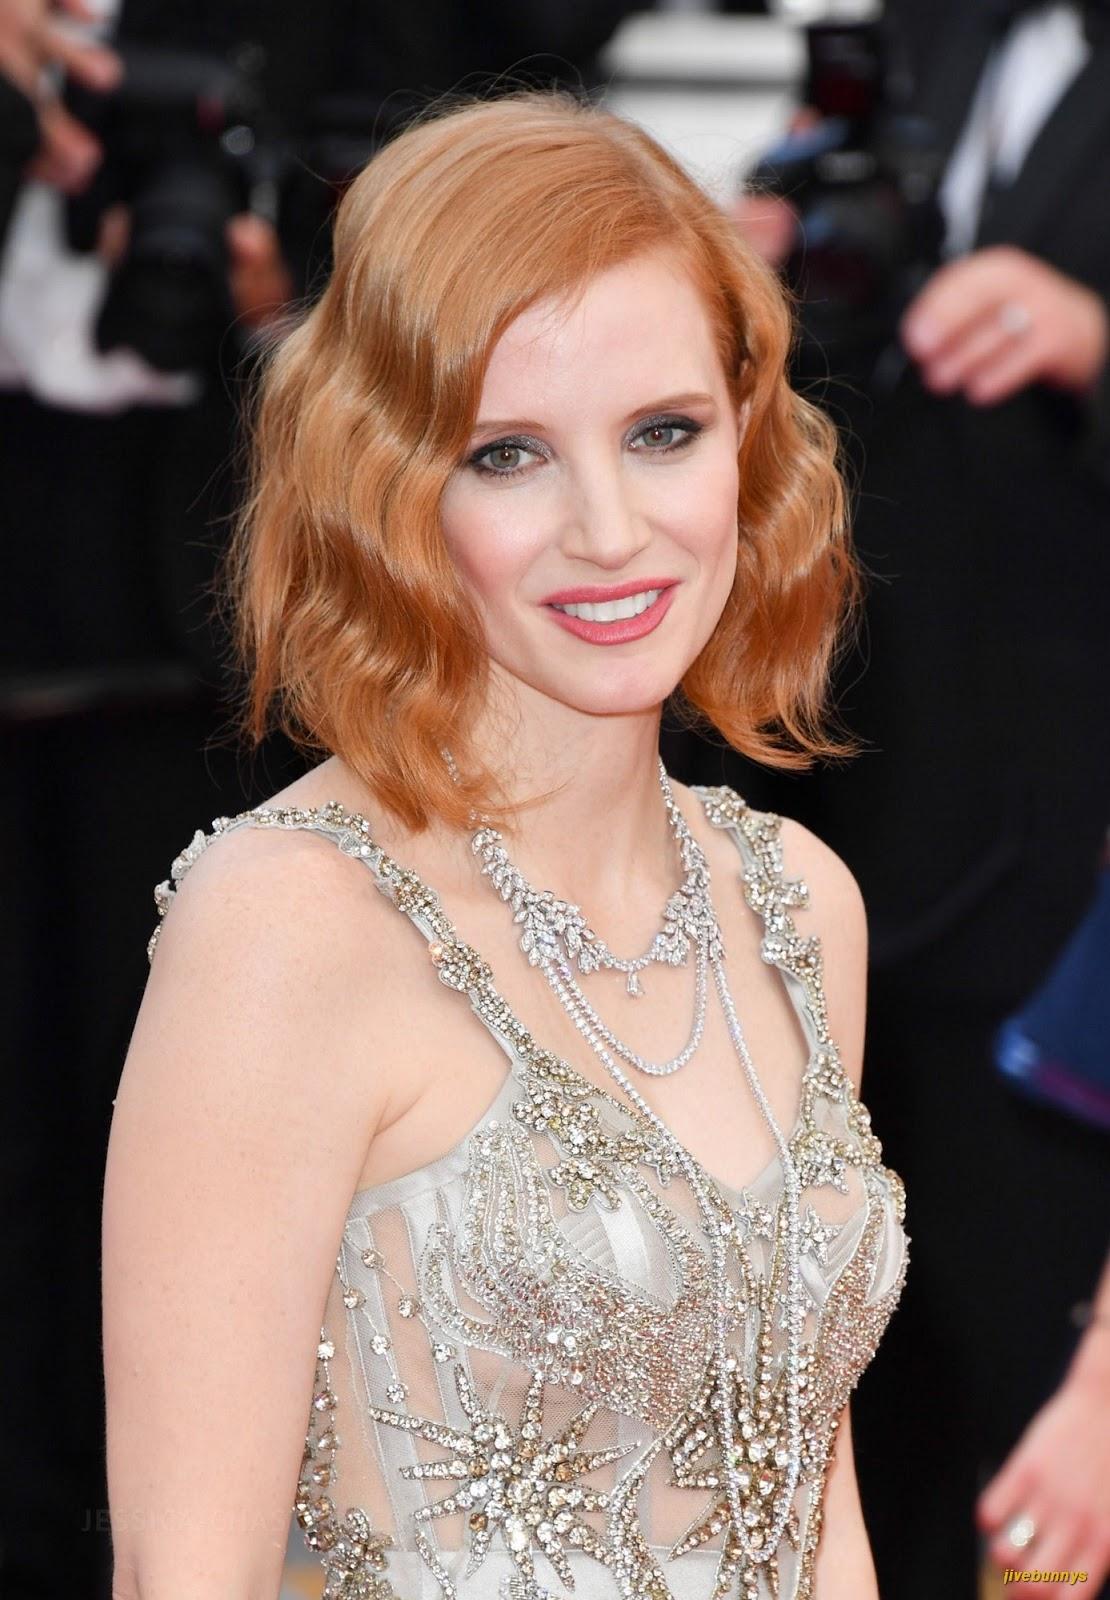 Jivebunnys Female Celebrity Picture Gallery: Jessica ... Jessica Chastain Movies